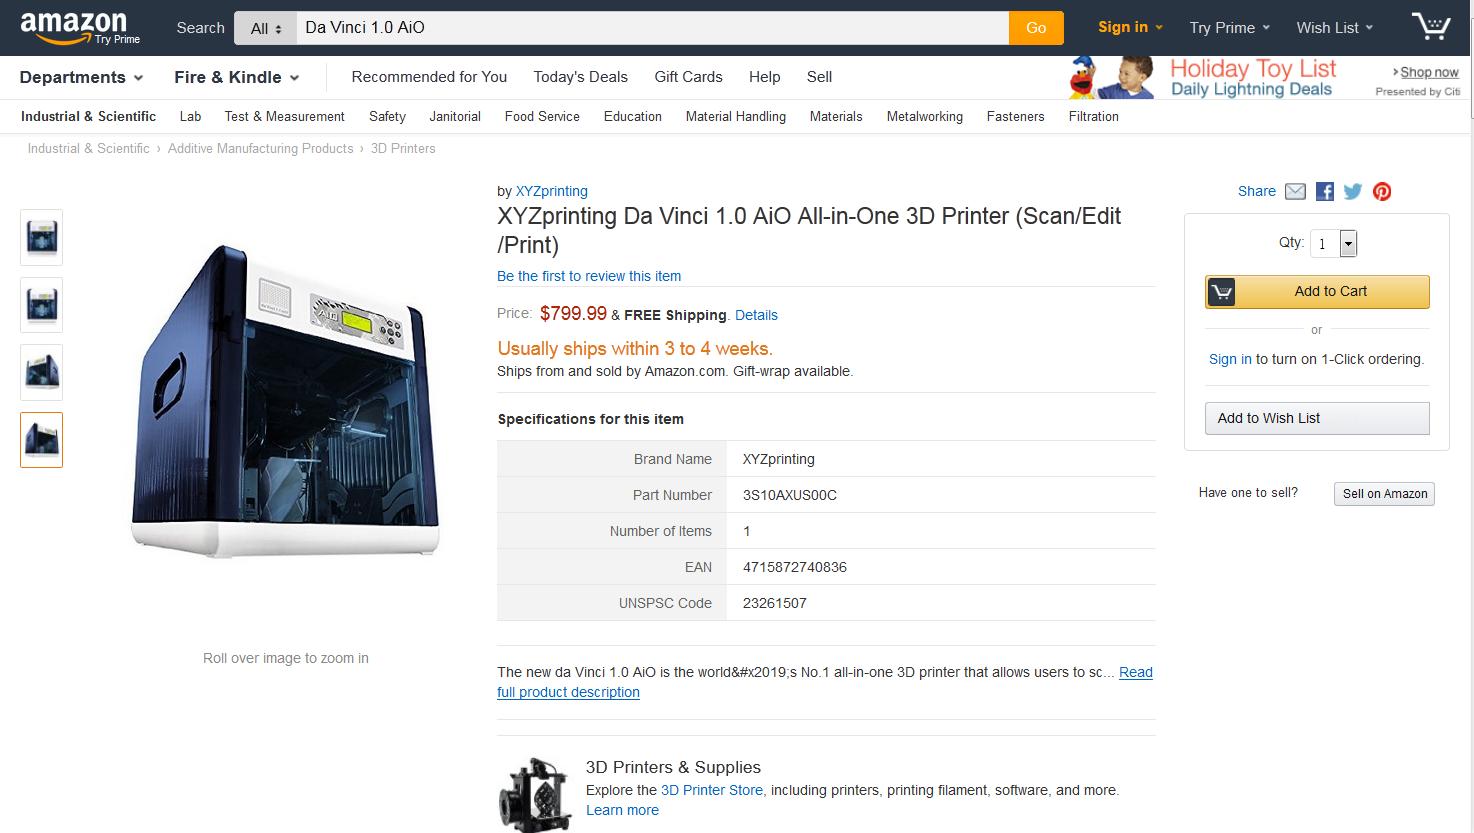 XYZprinting Da Vinci 1.0 AiO All-in-One 3D Printer Amazon